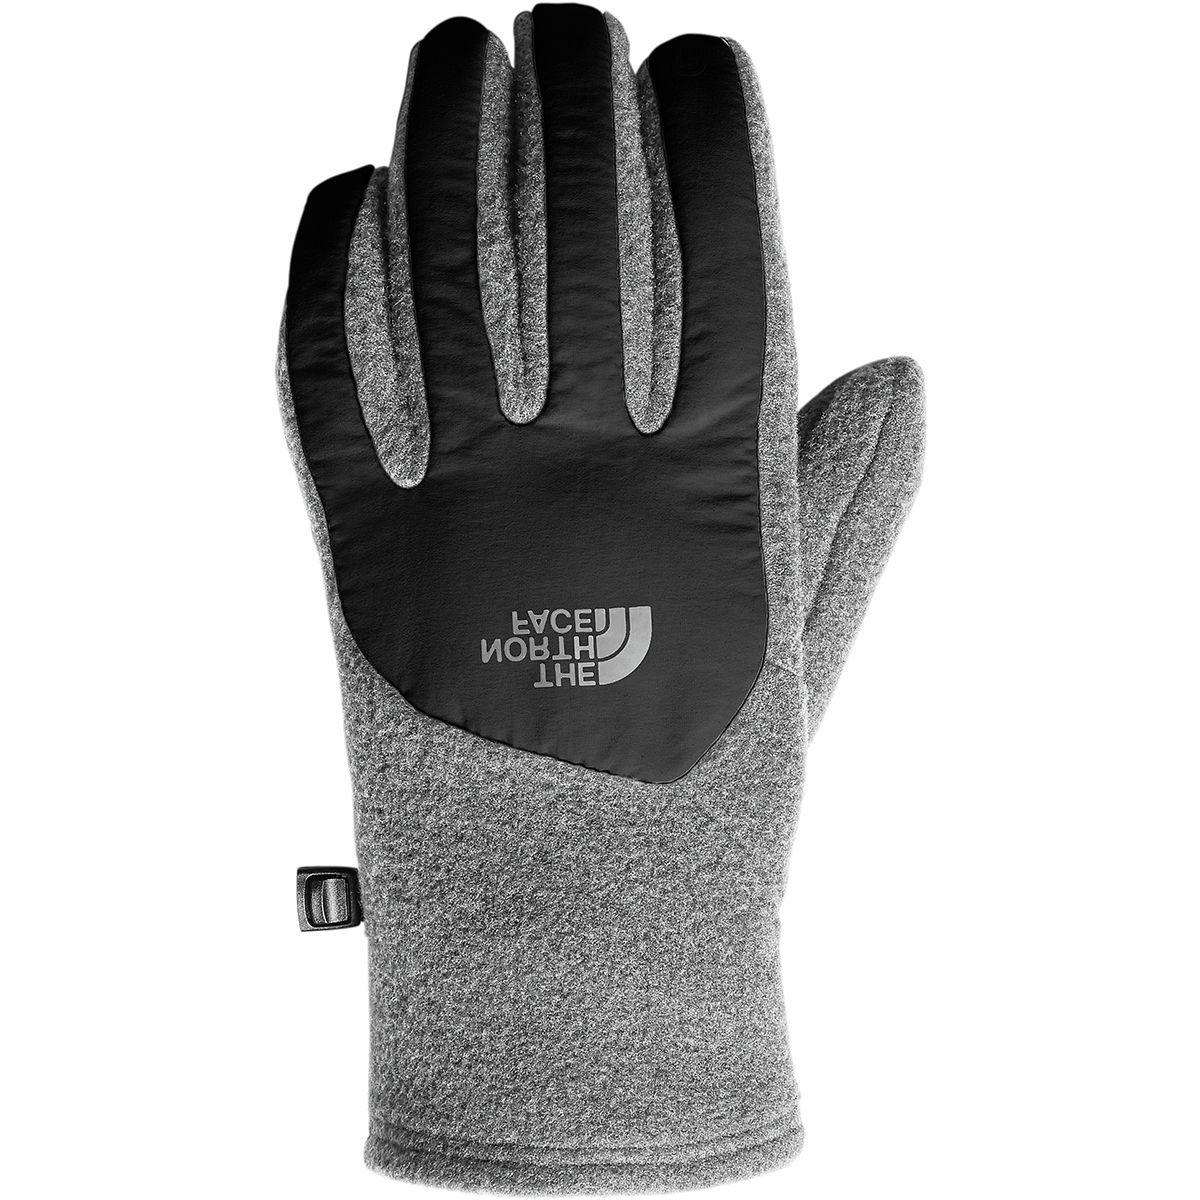 The North Face Denali Etip Glove - Women's